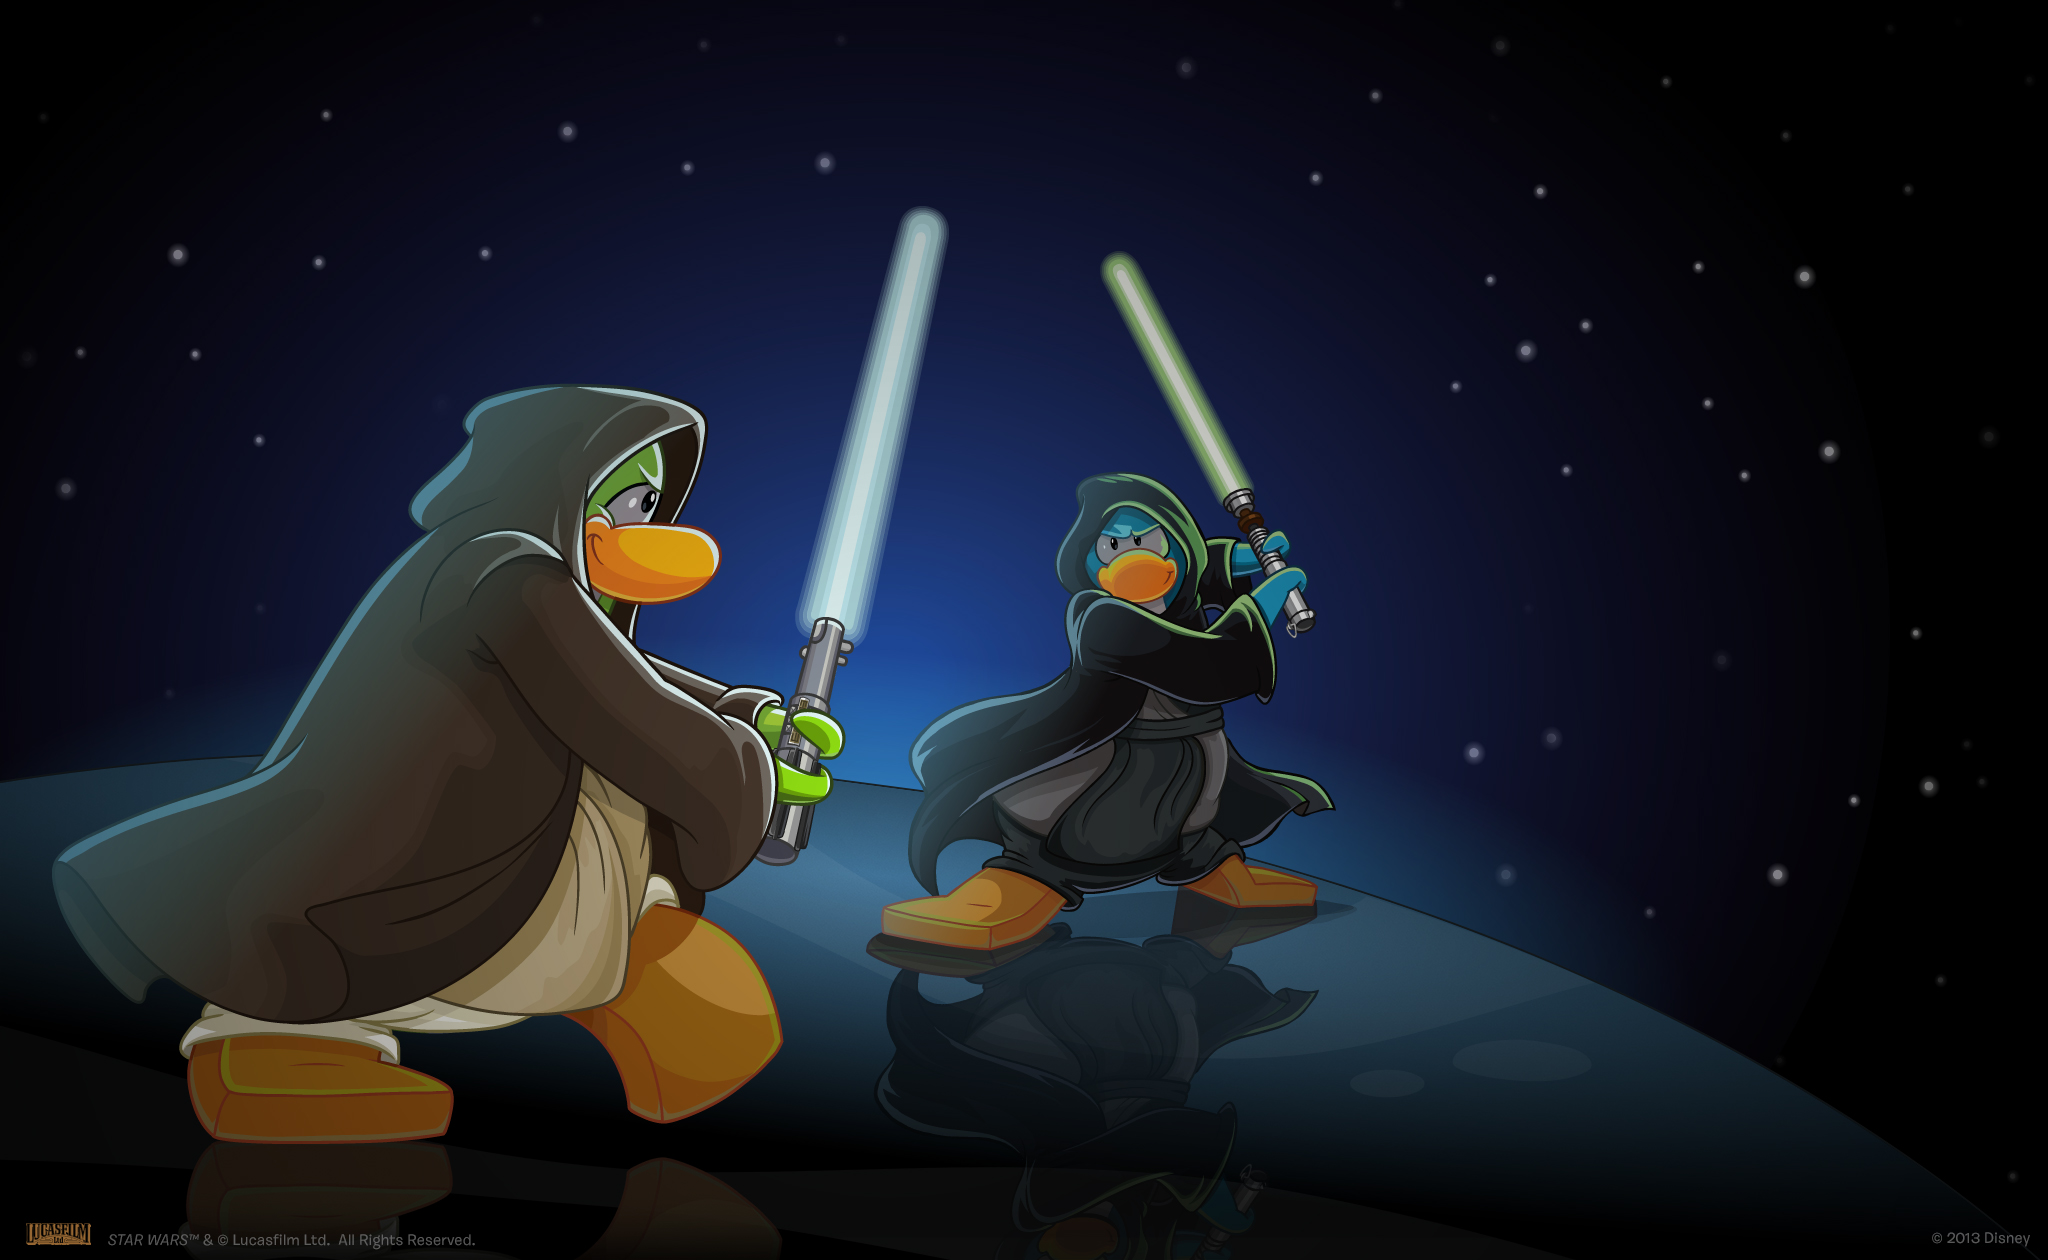 clubpenguin_starwars_dueling_jedi_2048x1260-1